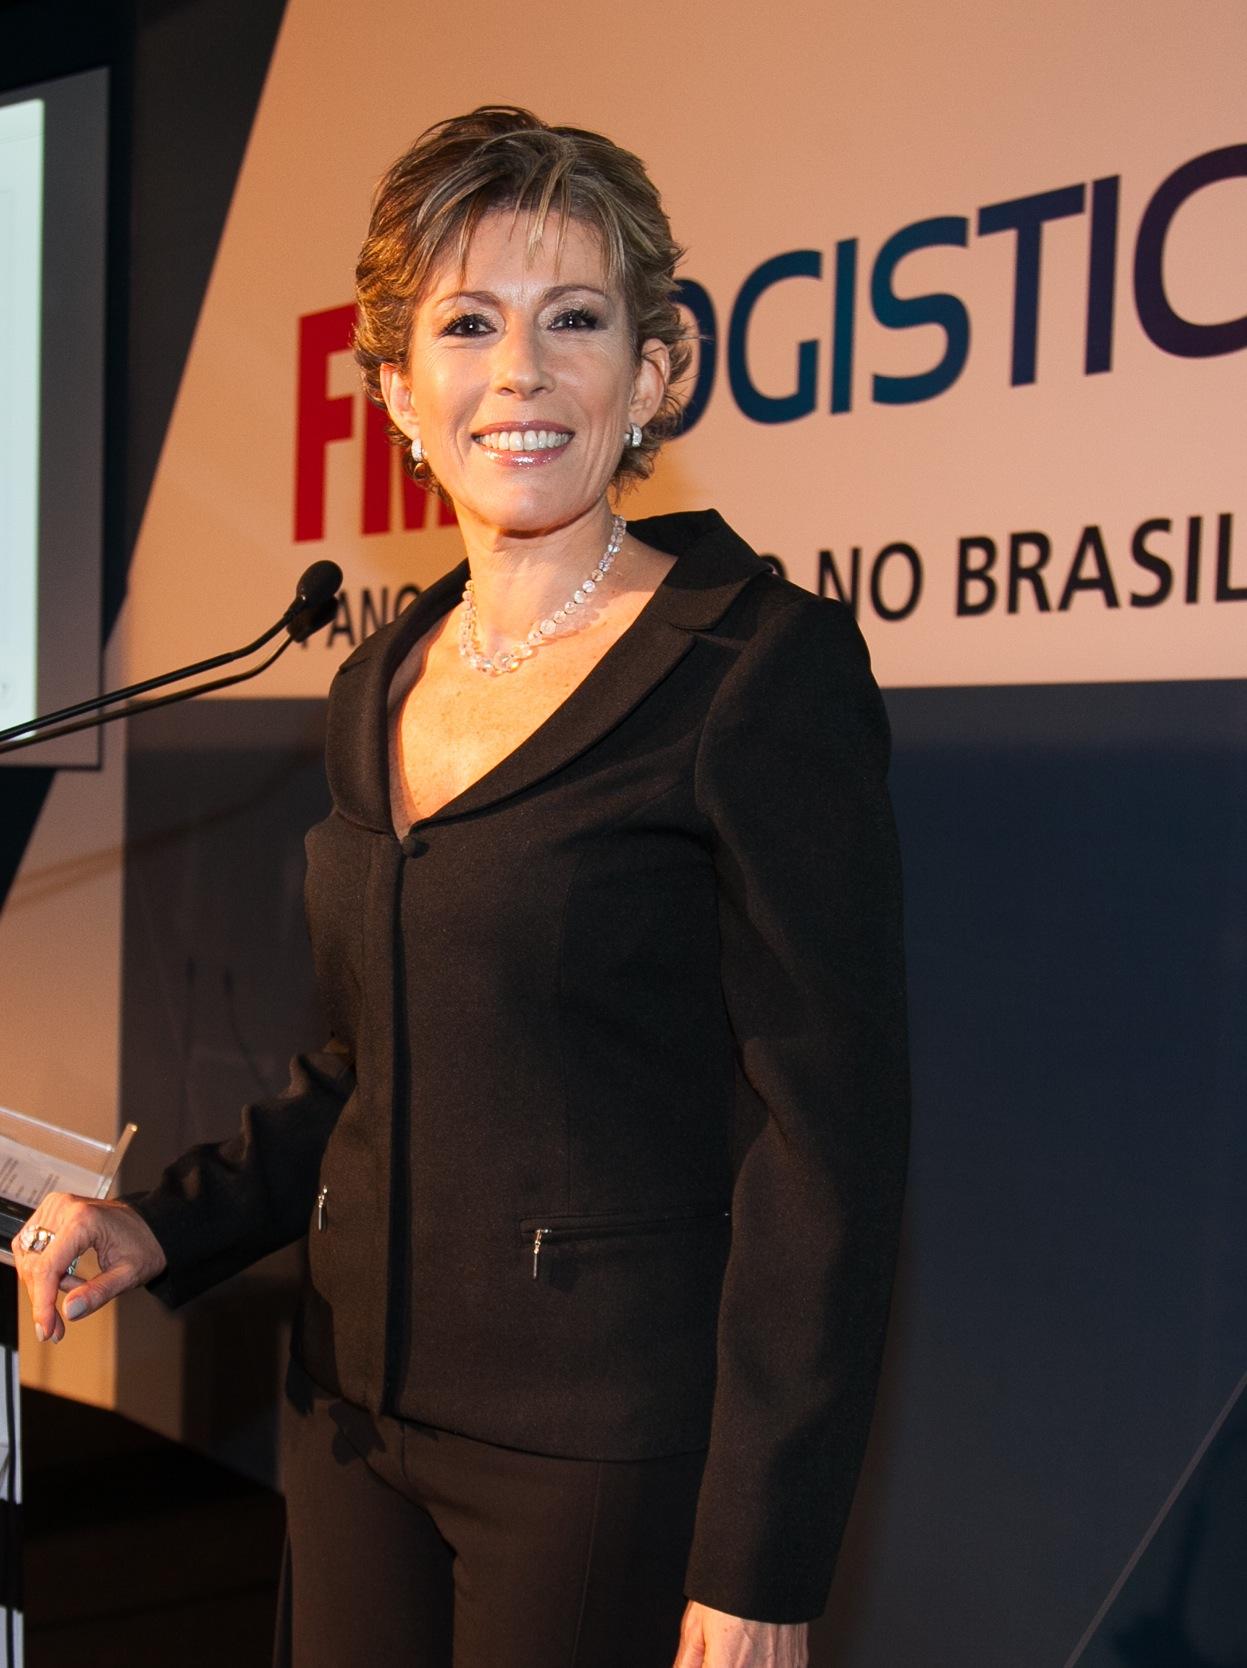 FM Logistic - Mestre de Cerimônia